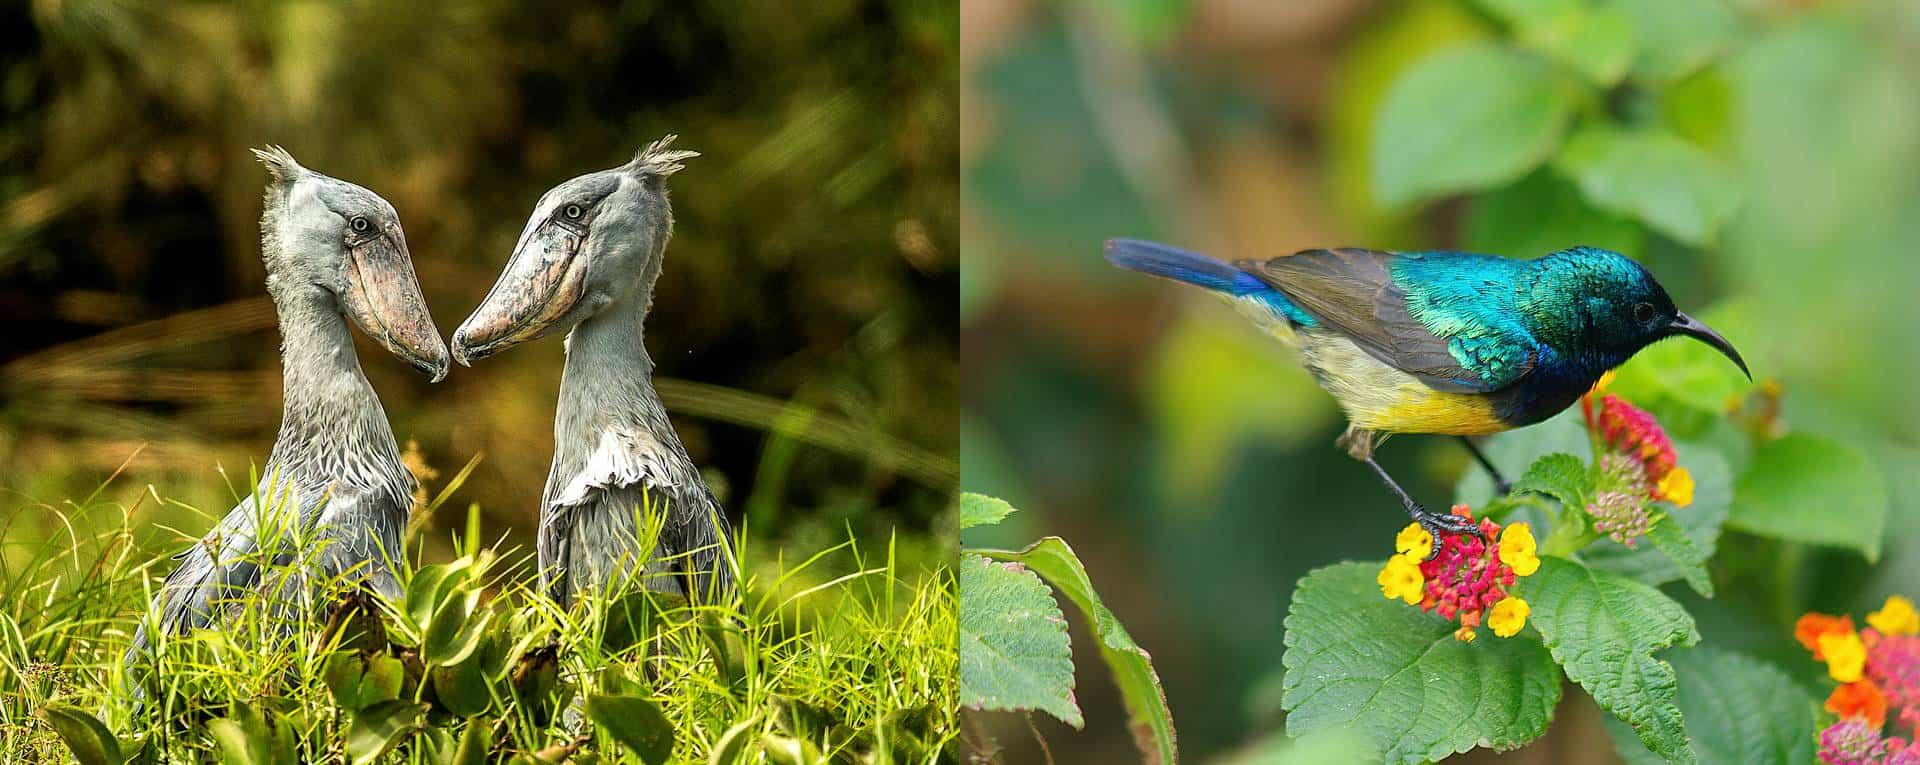 Birding Safaris Trip Planning Guide For Uganda